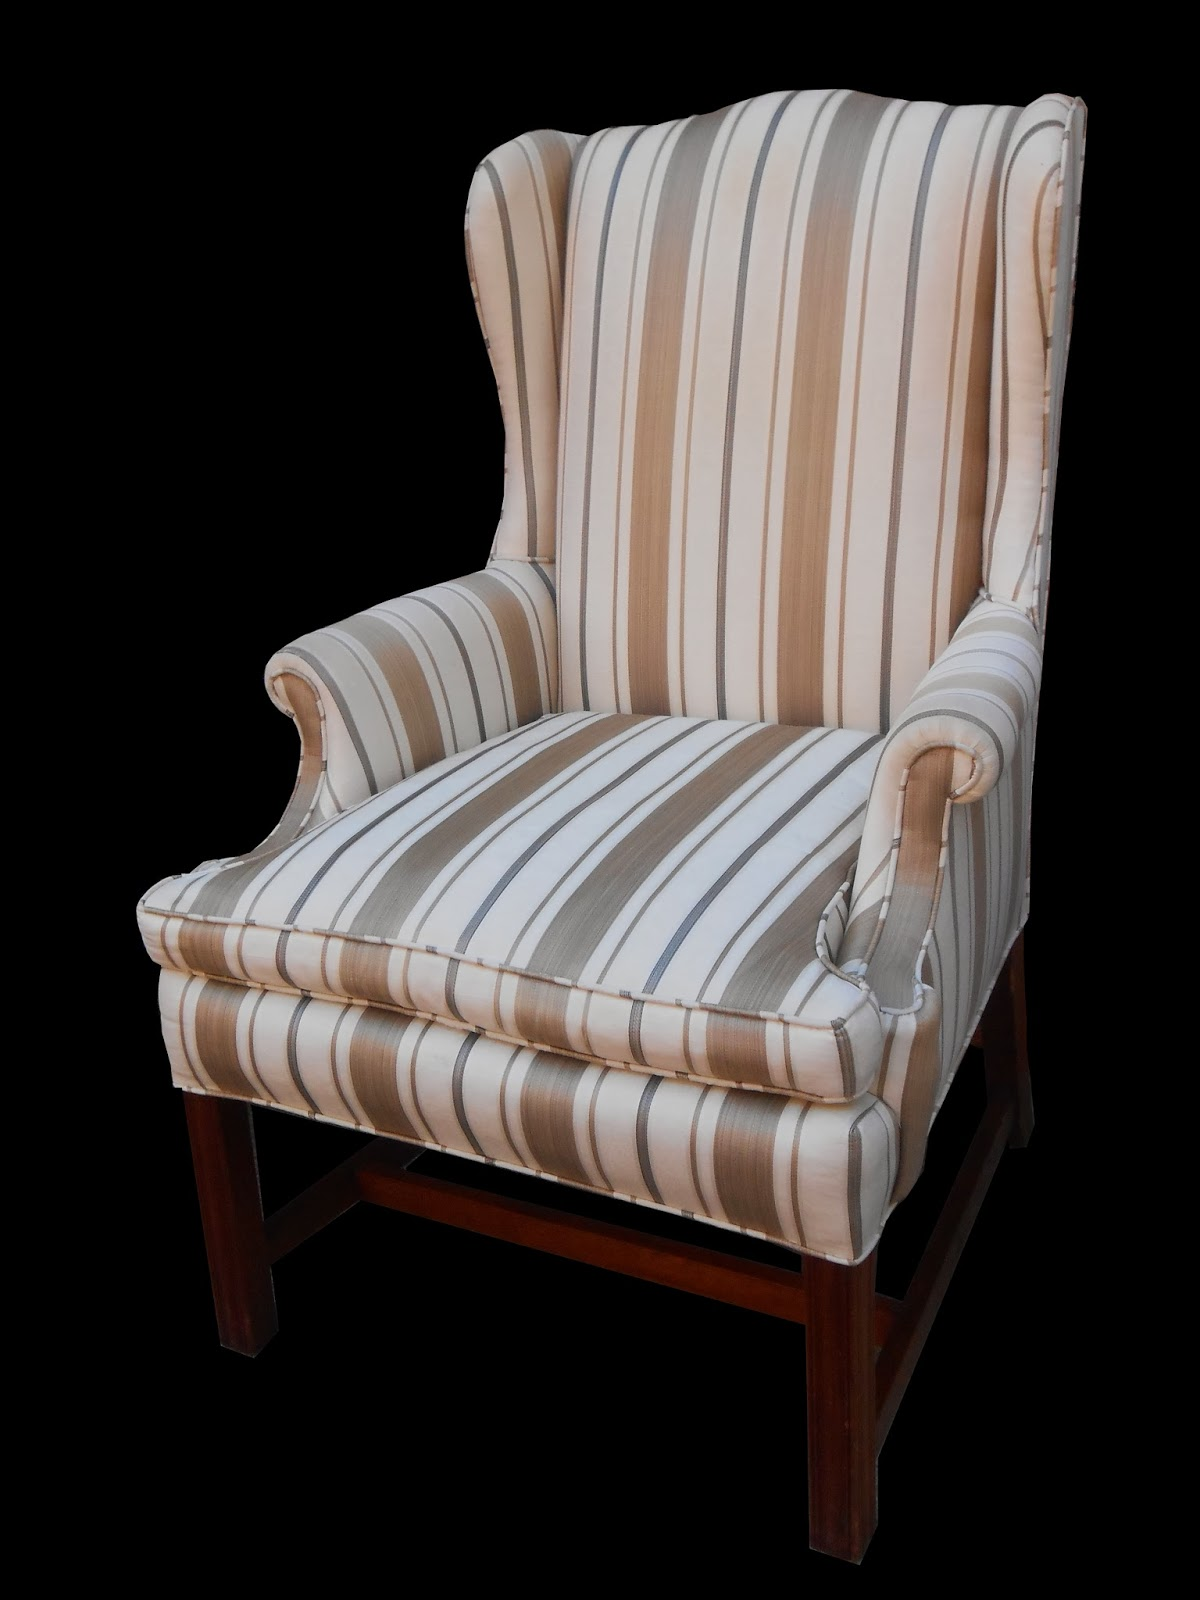 striped wingback chair design catalogue uhuru furniture and collectibles white tan stripe